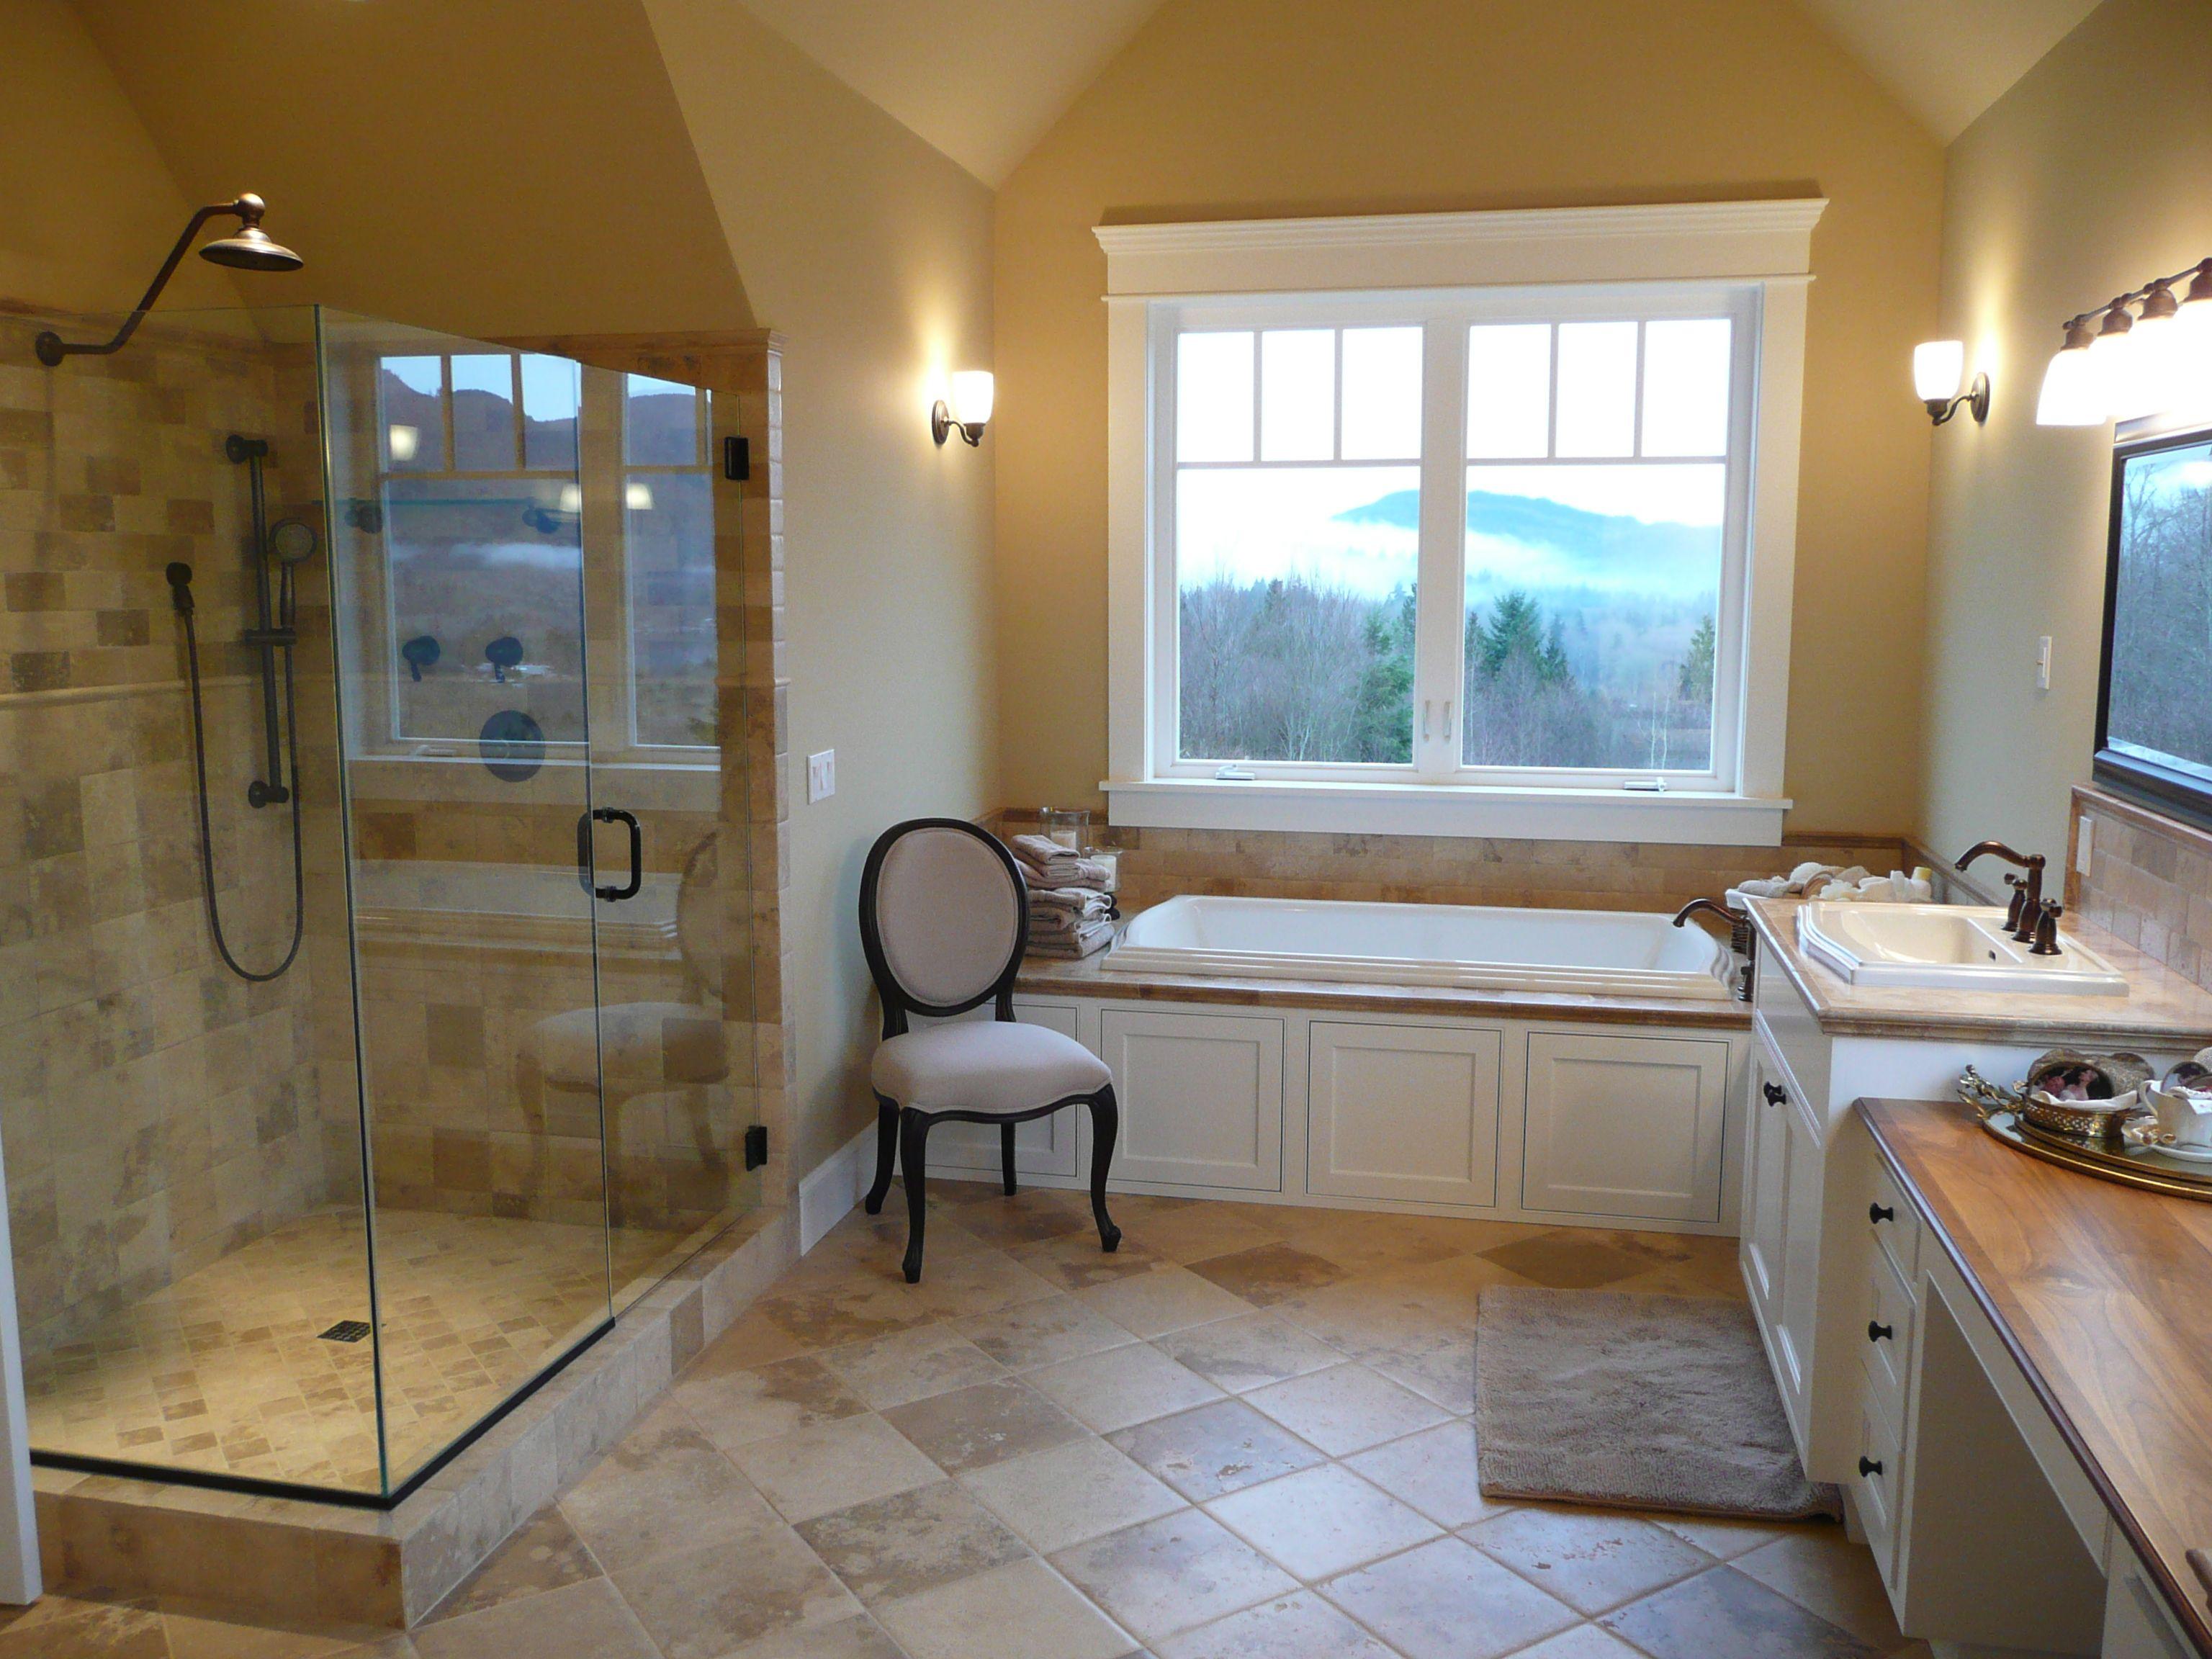 New tile floor and shower